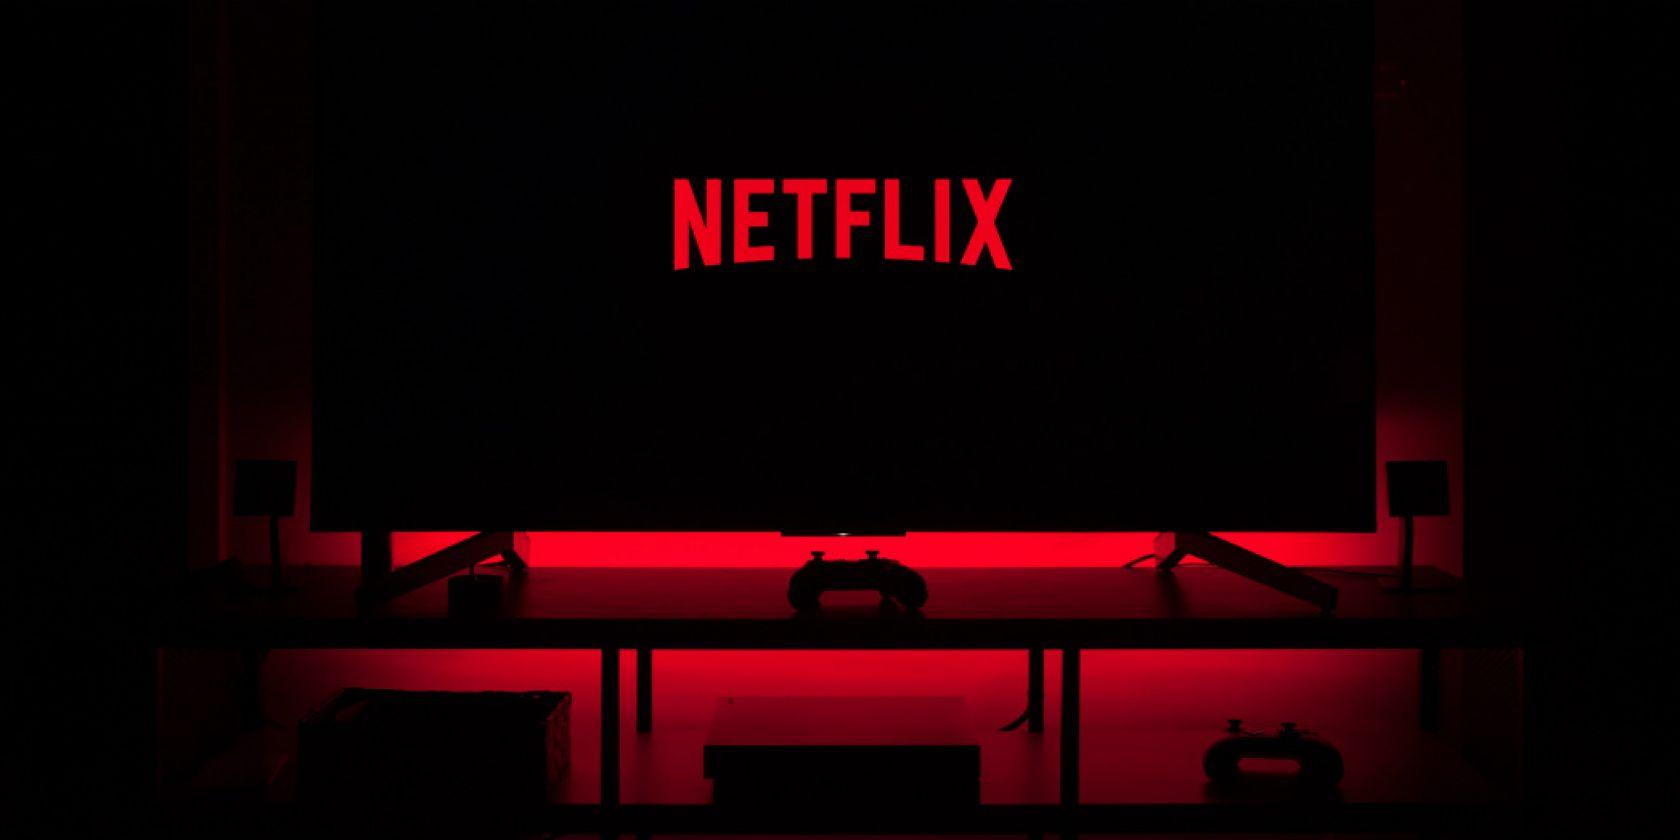 Зрители нашли пиратские субтитры в аниме на Netflix - 1